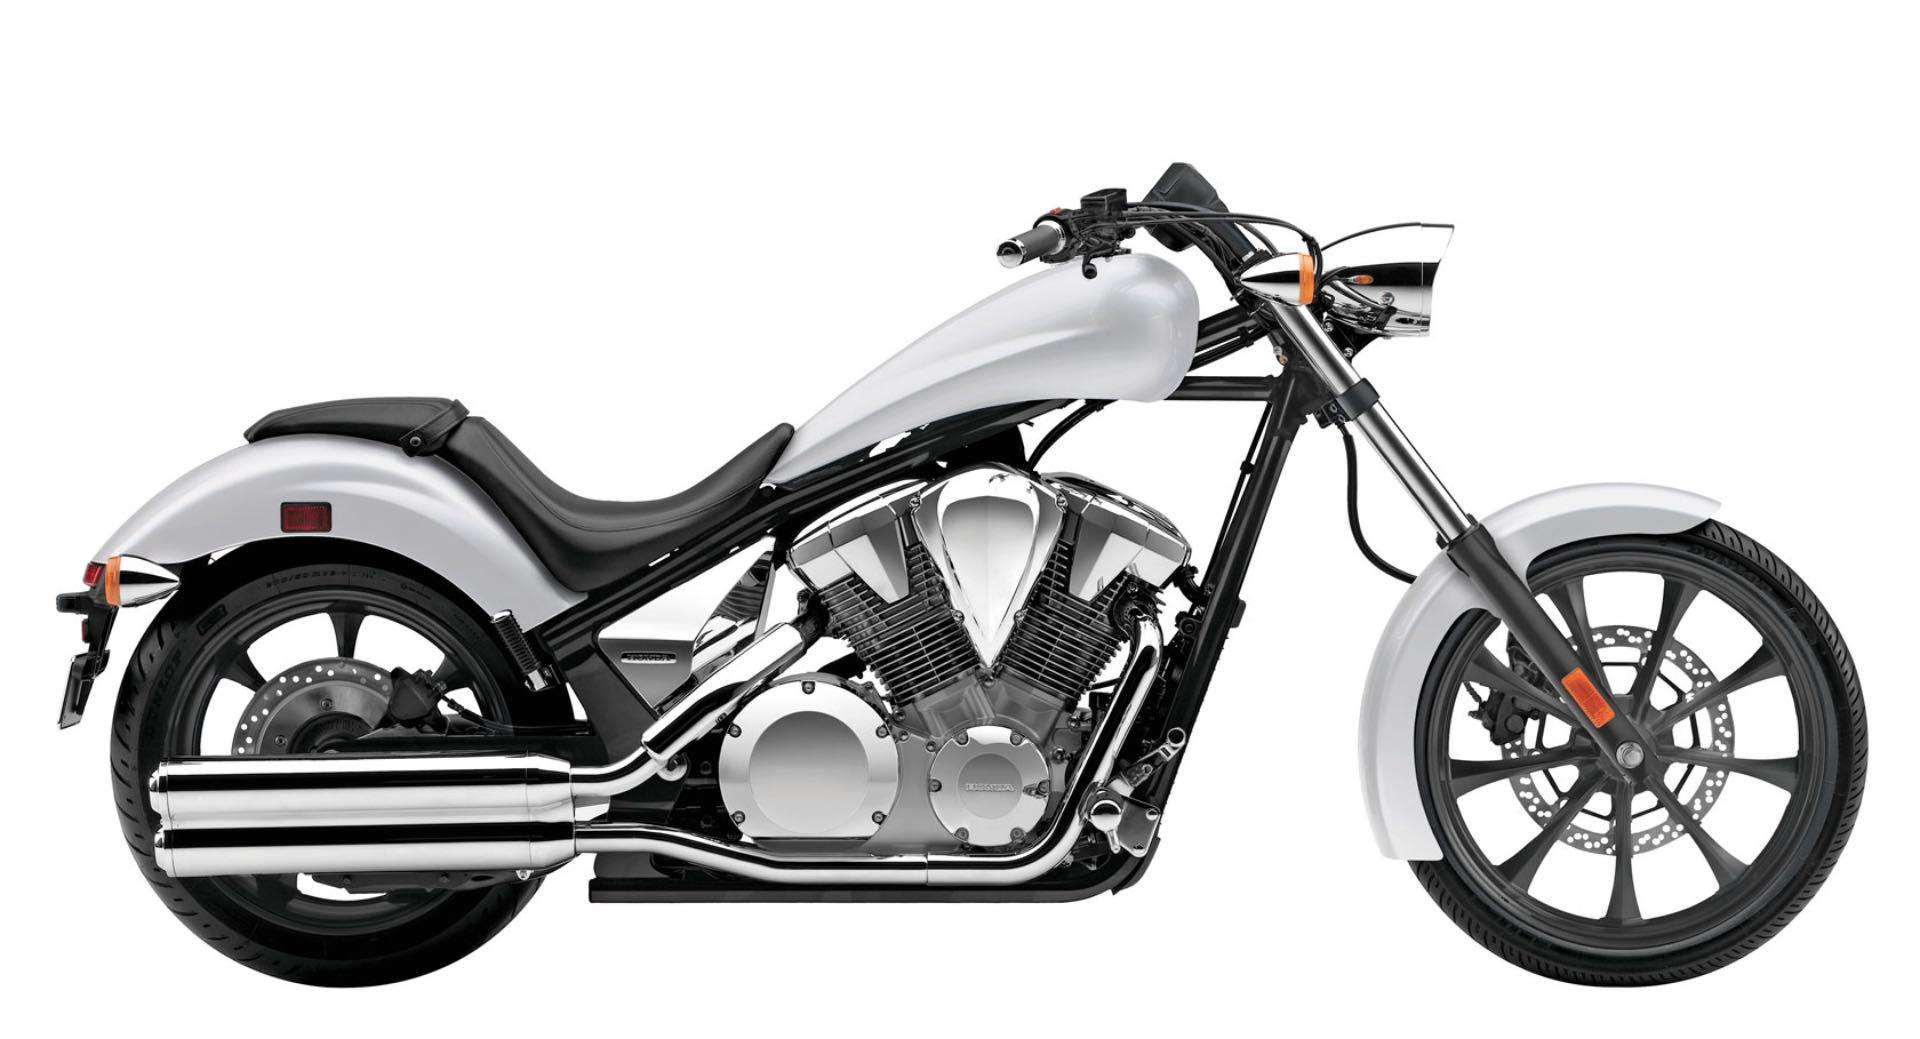 2017 Honda Vt1300cx Fury Motorcycle Recall Fuel Tank Problems